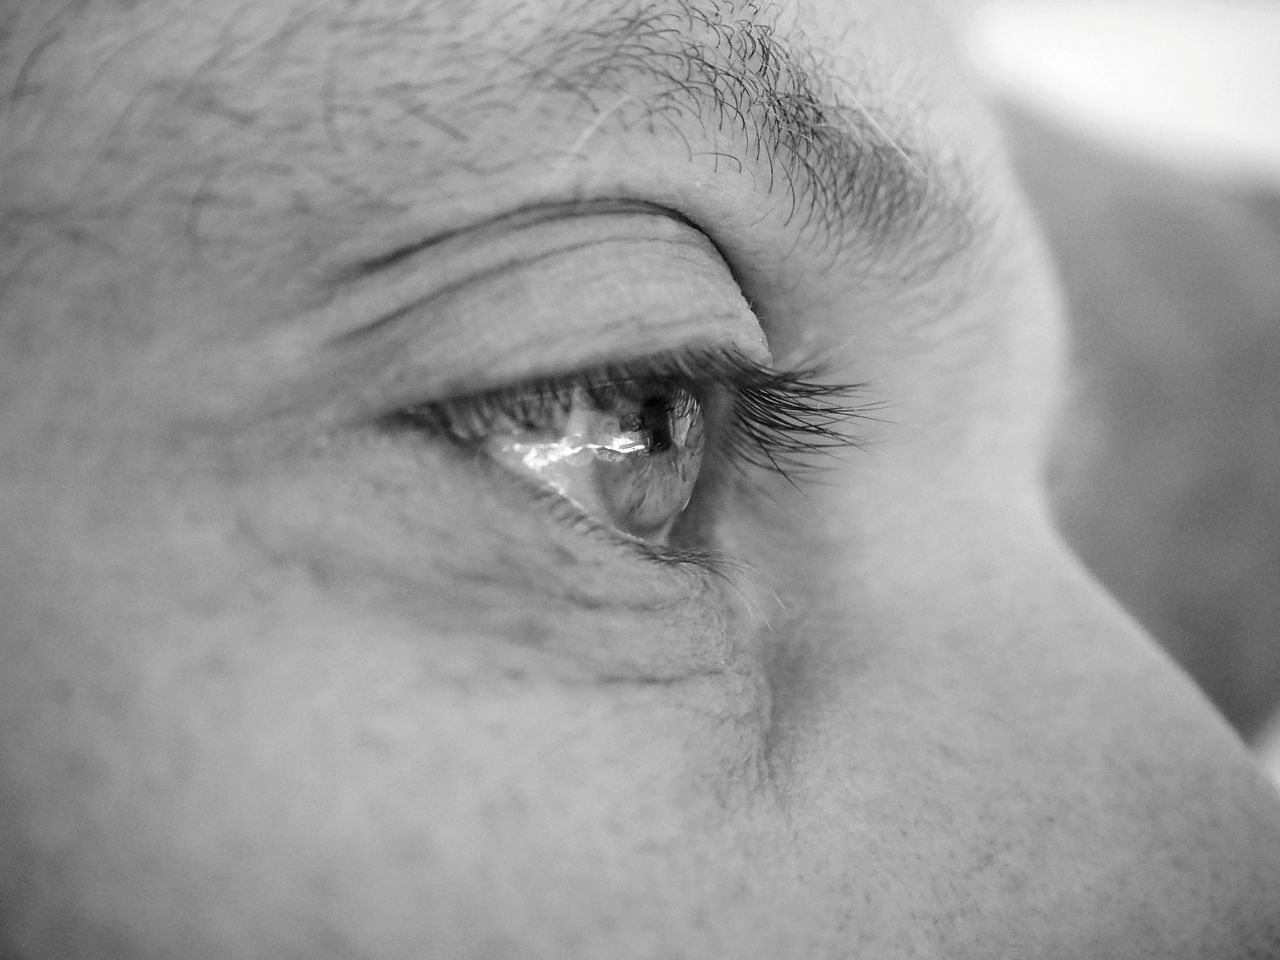 One Person Human Body Part Eyelash Human Skin Close-up Sensory Perception Eyebrow Real People Human Eye EyeEmNewHere Home Is Where The Art Is Man Eye Eye Eyes Eyes Are Soul Reflection Blackandwhite Blackandwhite Photography Monochrome Photography Eye Reflection  Light Reflecting Eyes People Man Made Object Midleage Home Family